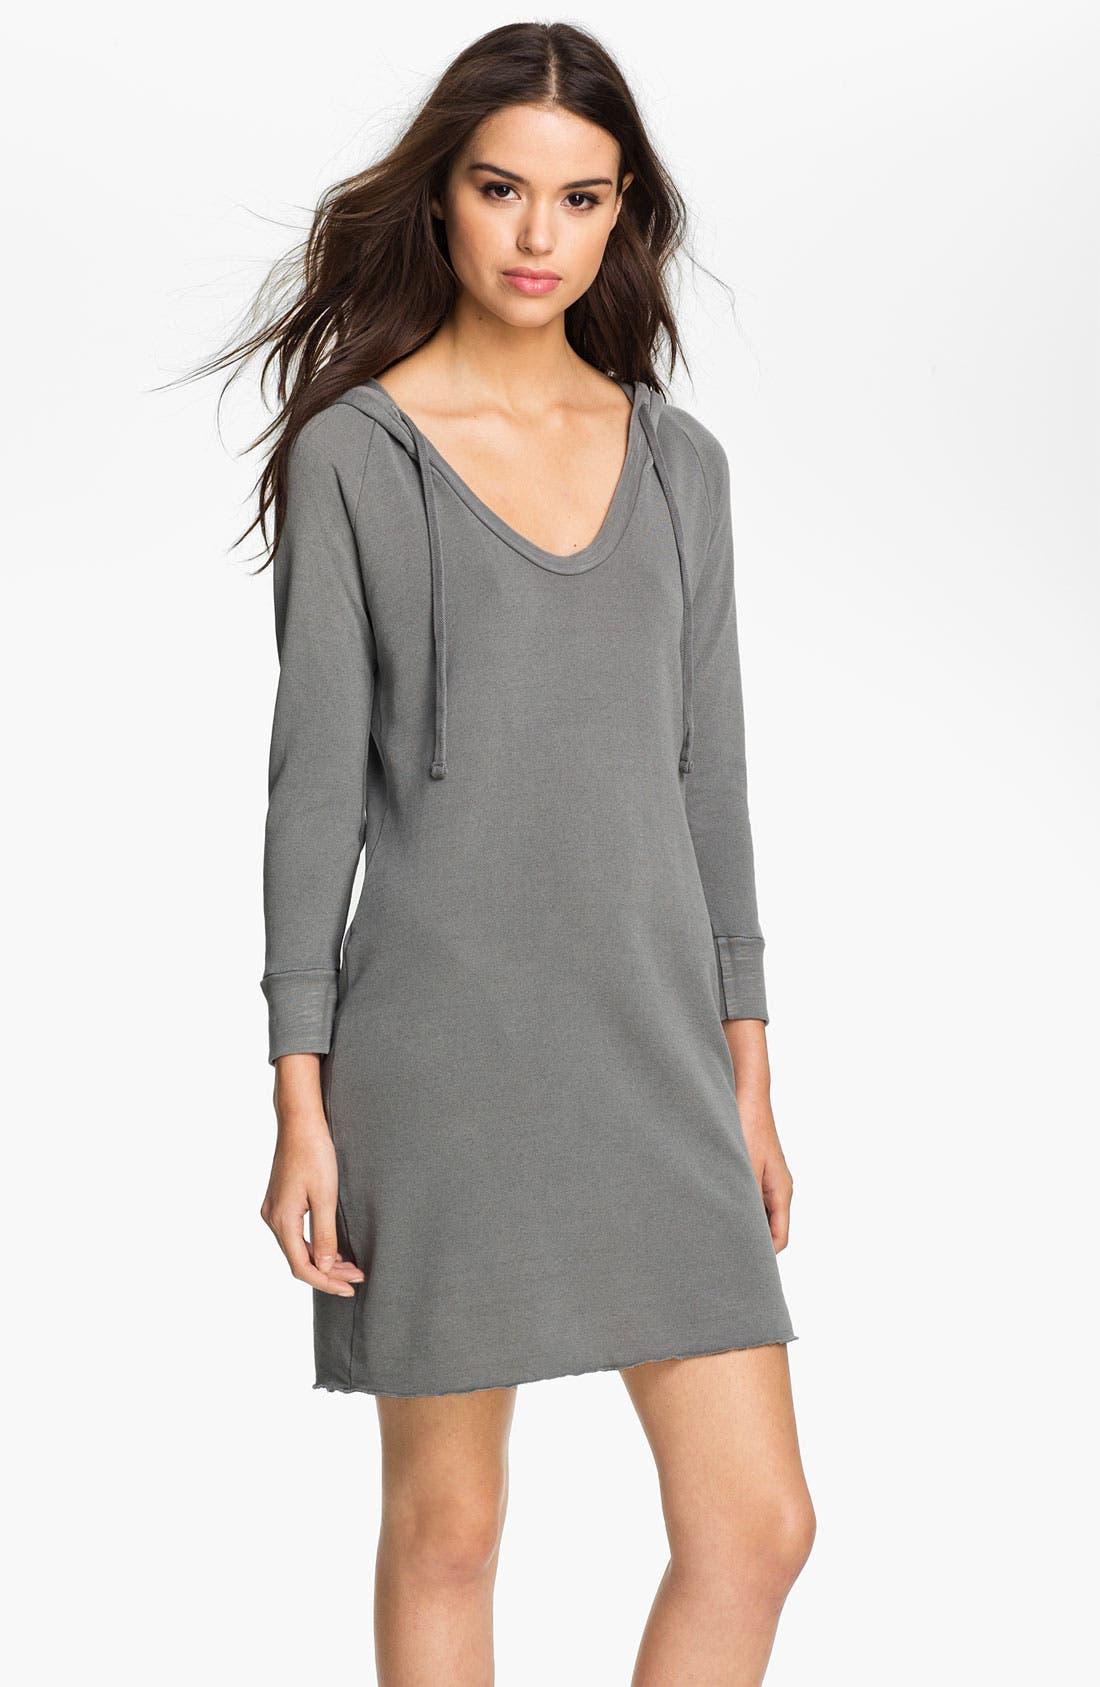 Main Image - James Perse Hooded Sweatshirt Dress